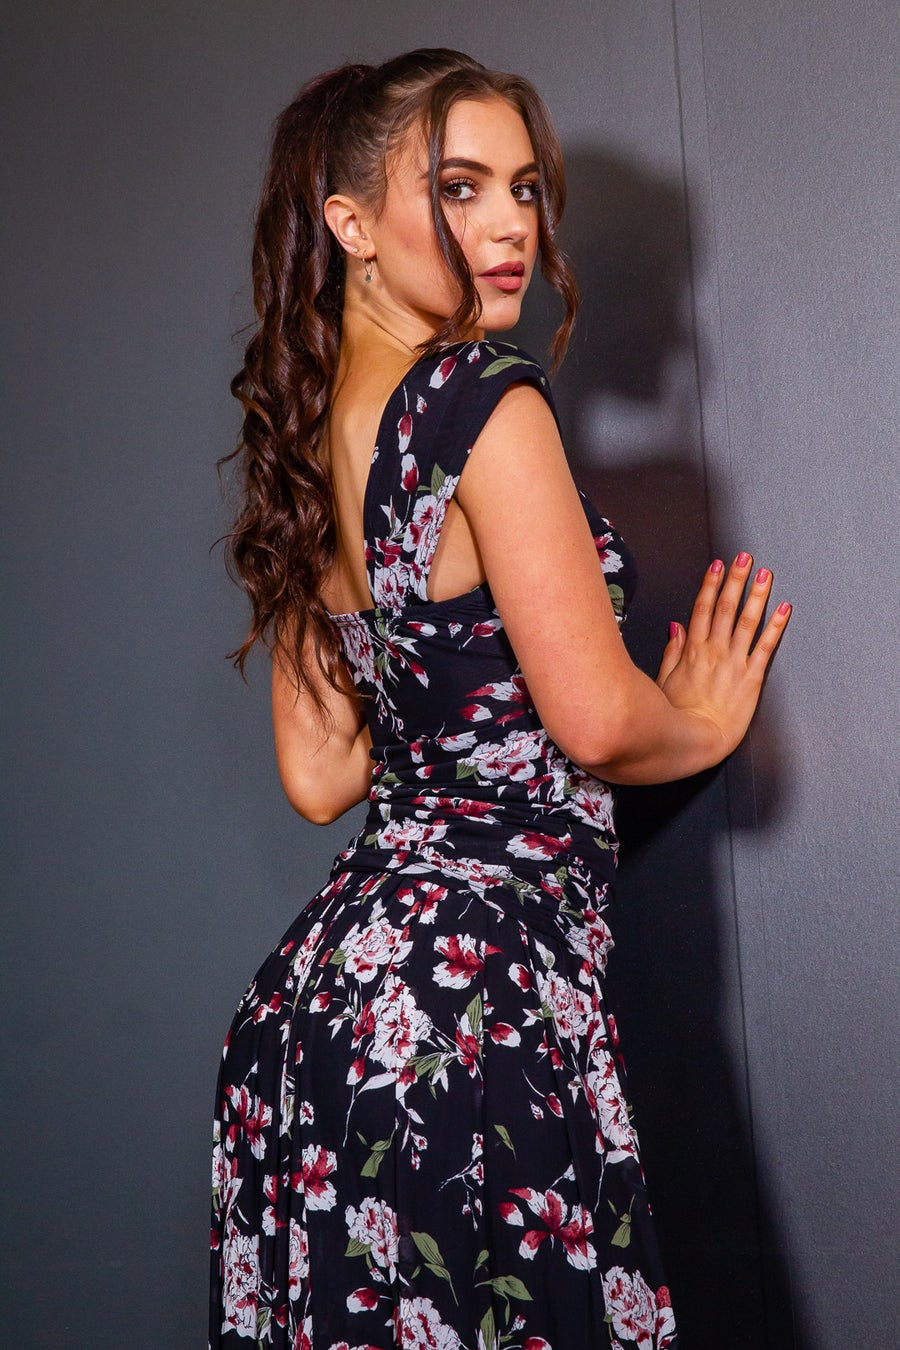 Image of CrissCross Top (E5977A) Alcea Dancewear latin ballroom